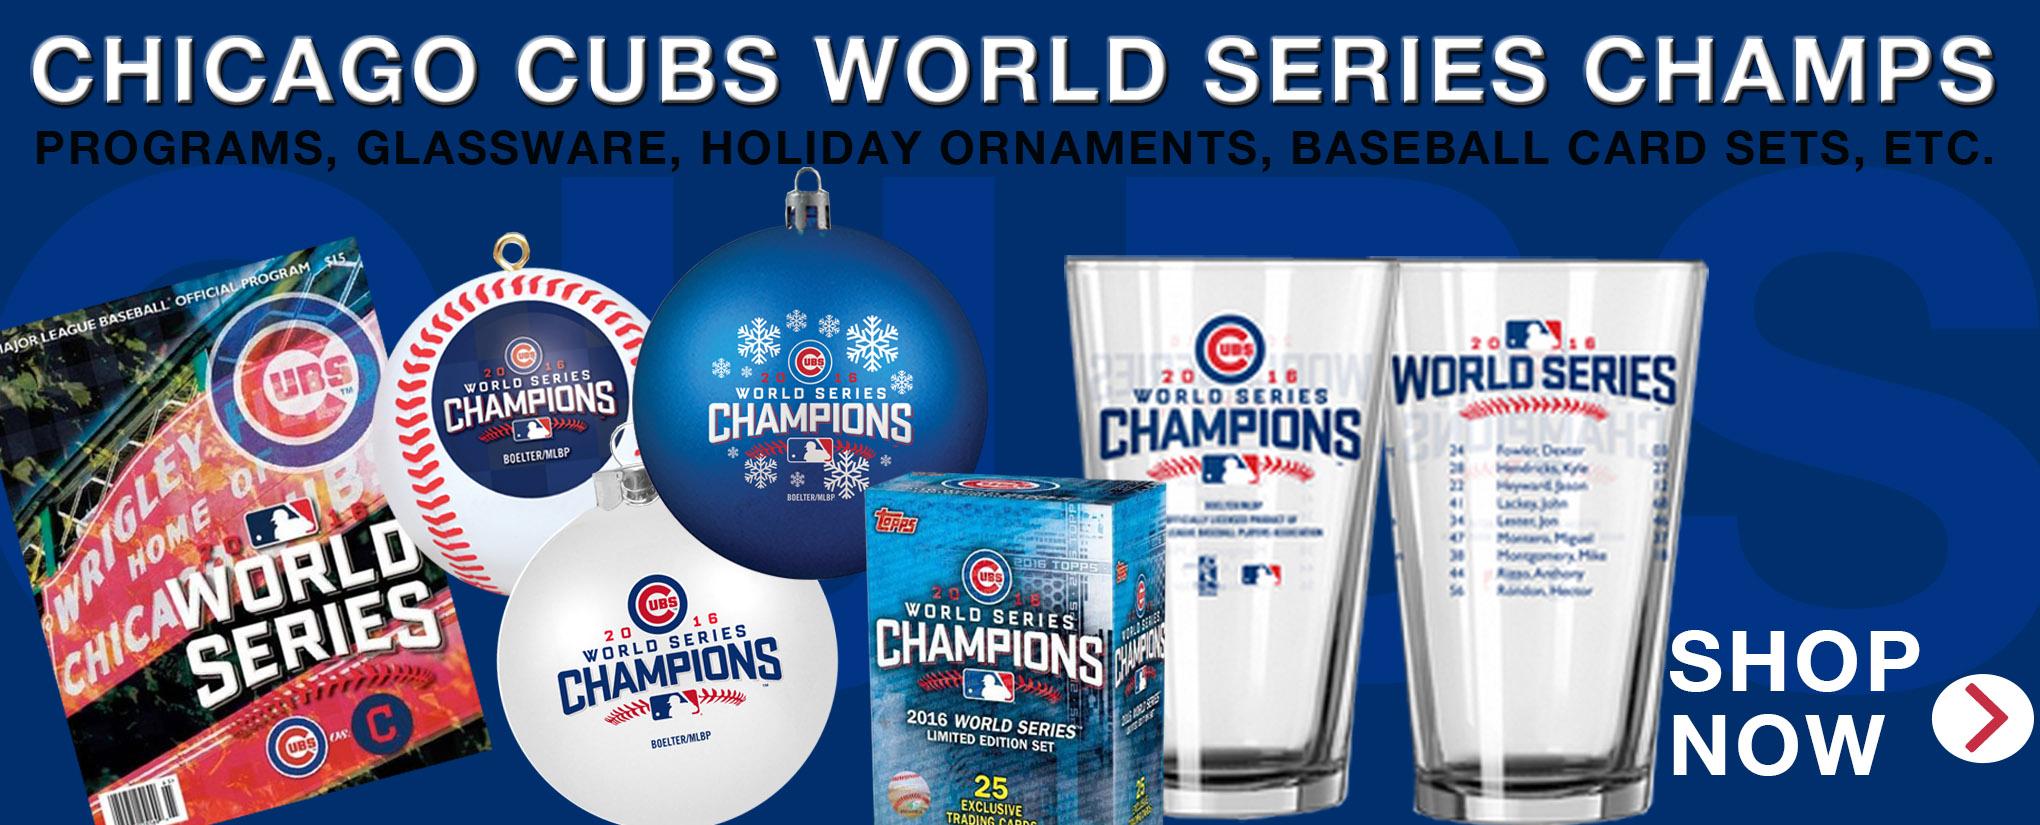 2016-cubs-champs-banner.jpg